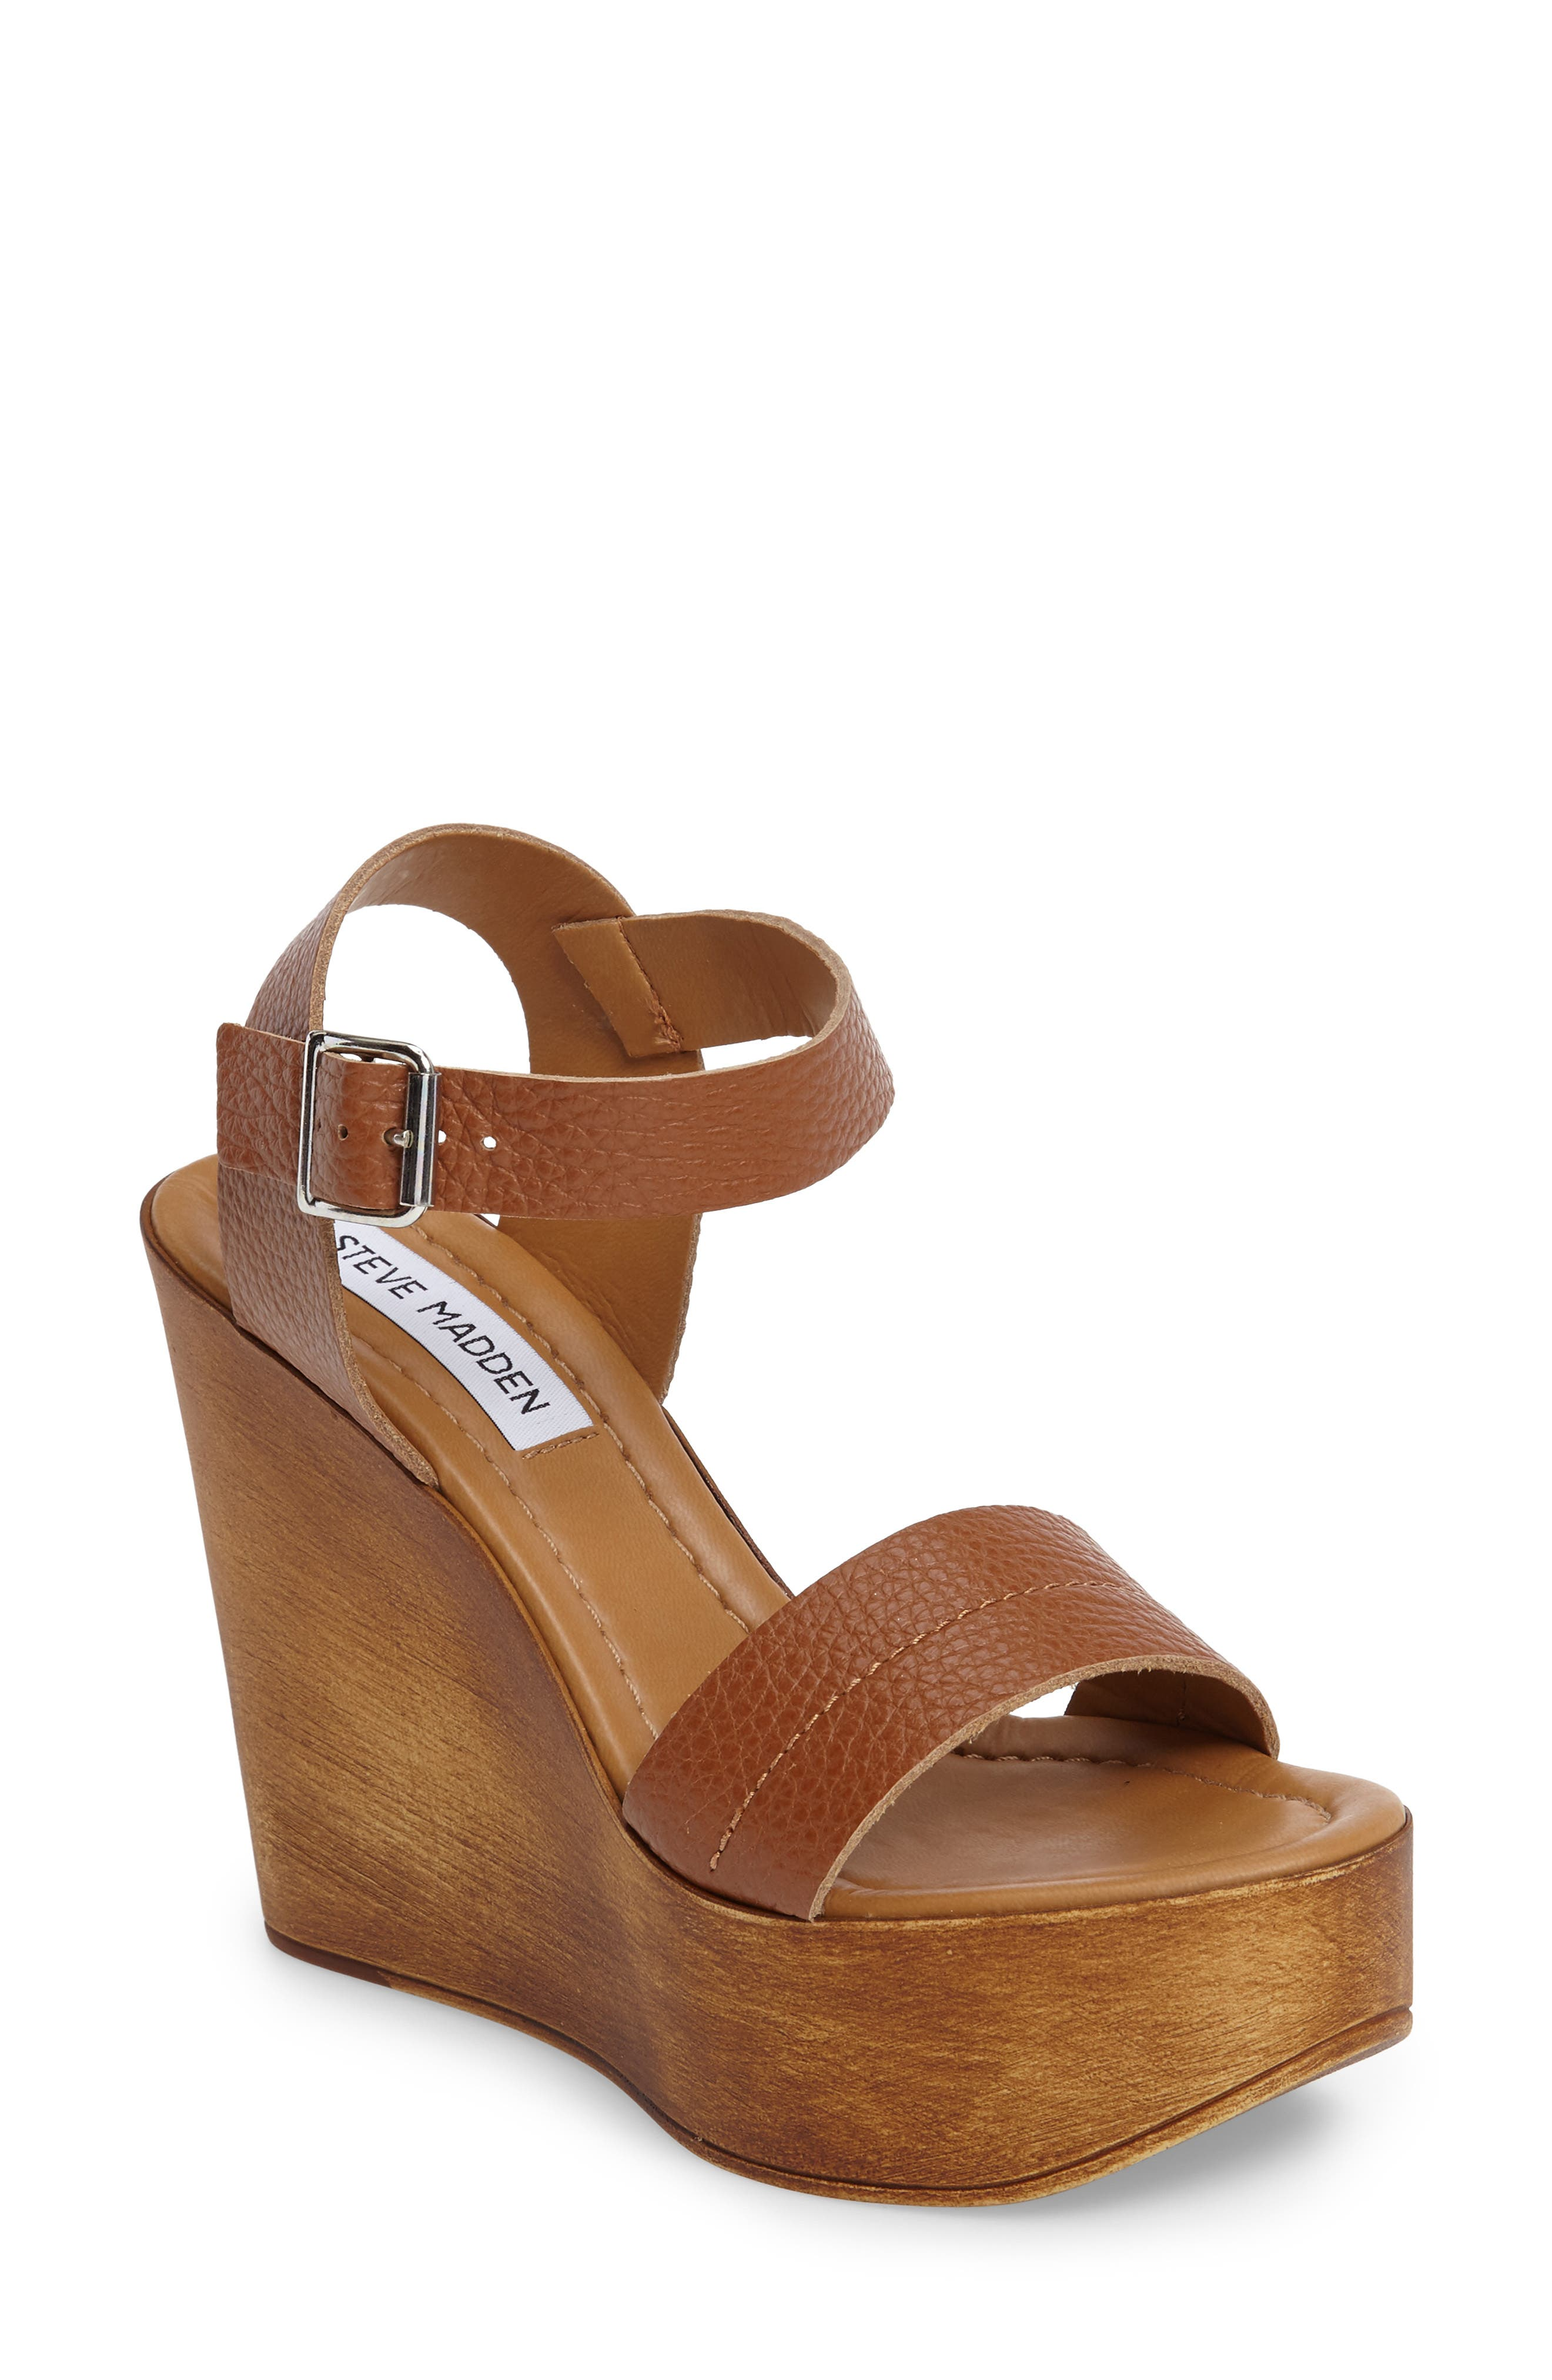 Belma Wedge Sandal,                         Main,                         color, Tan Leather